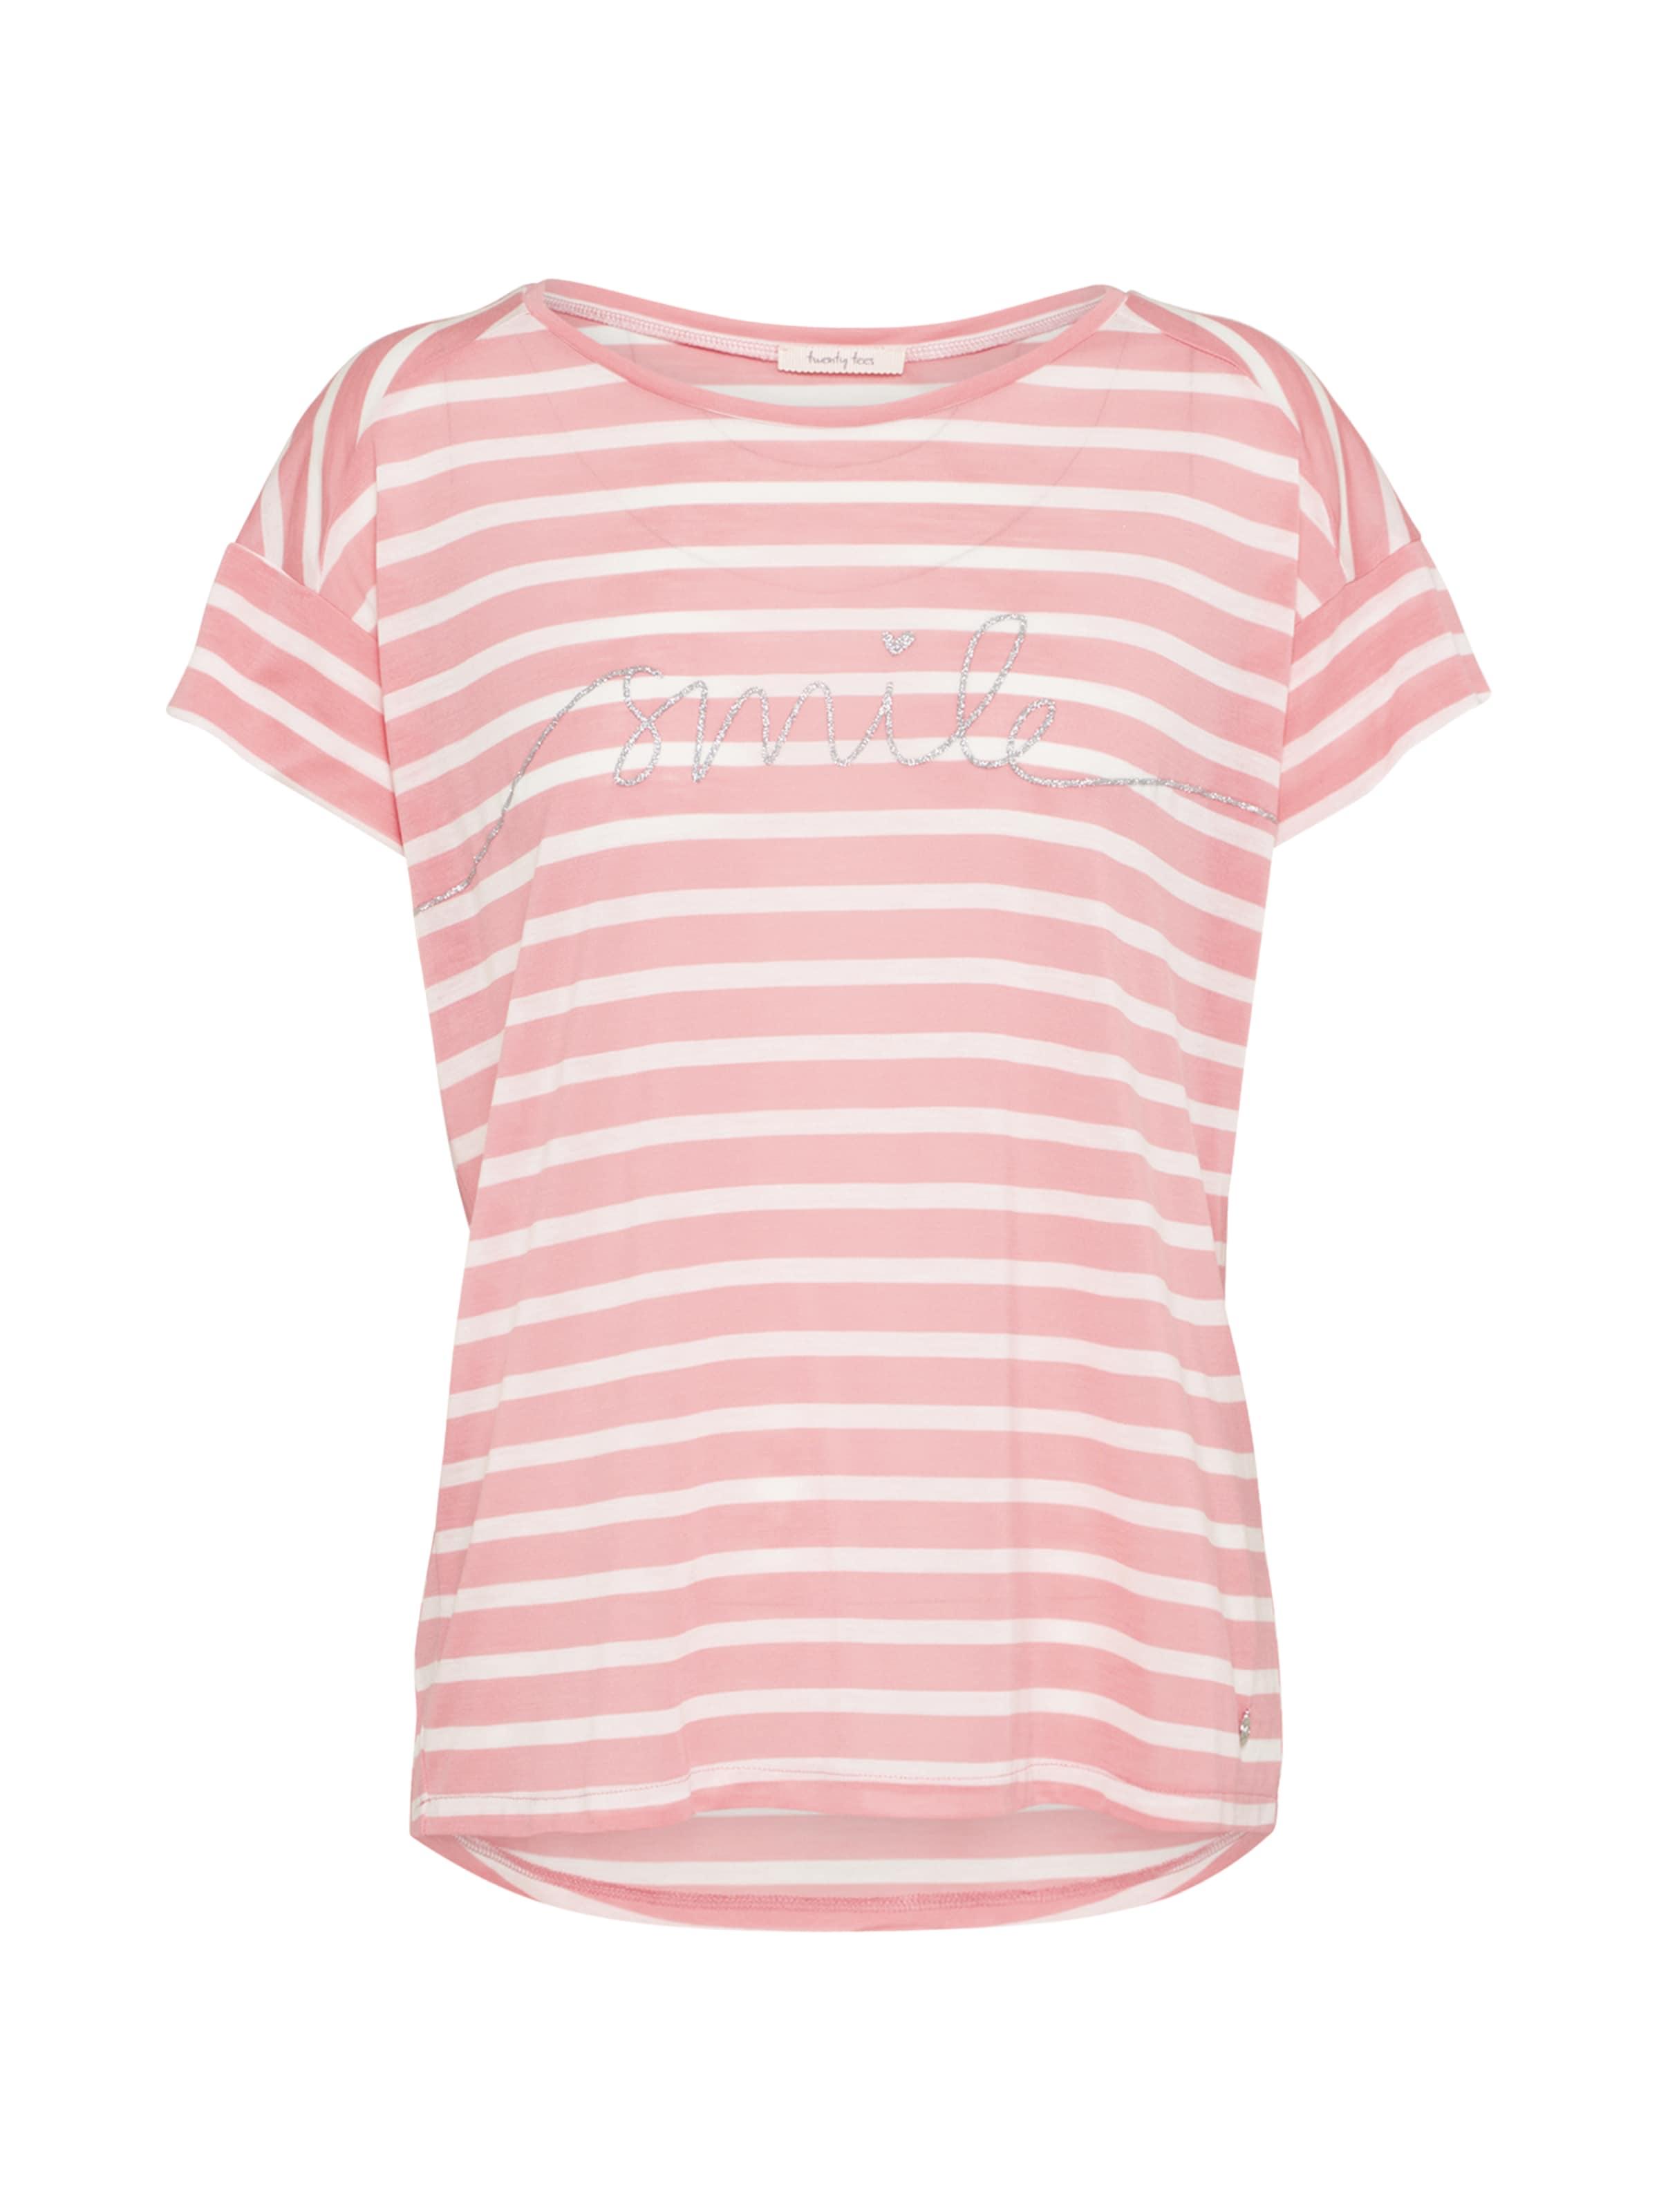 shirt 'smile In Twenty RosaWeiß Ringel' Tees T jzGqpLSUMV